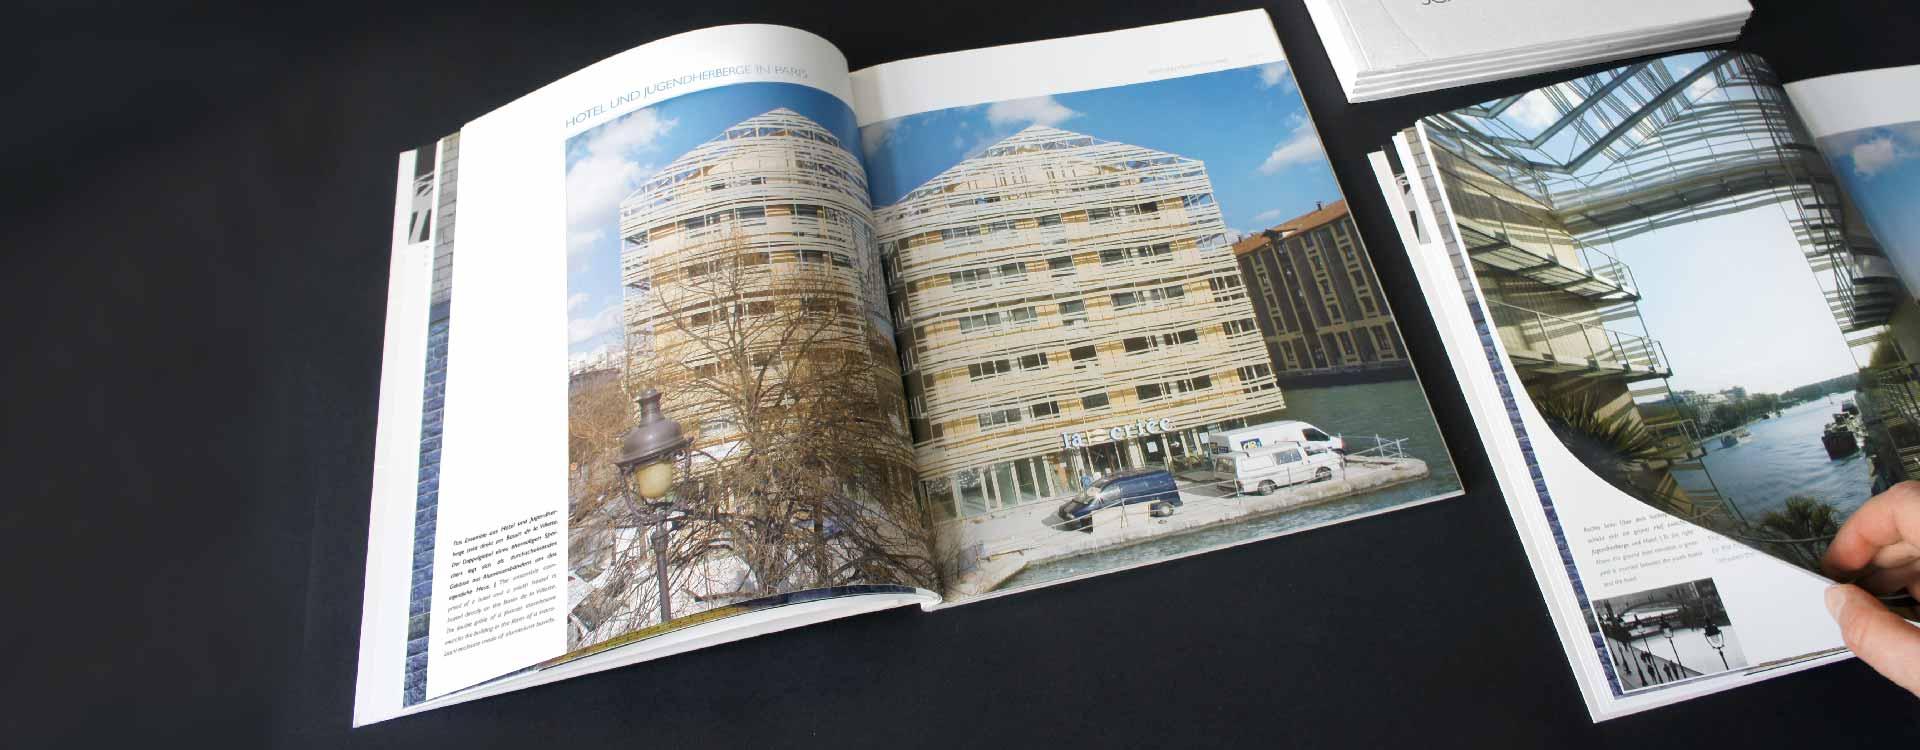 Inside pages of image brochure for JSWD Architekten, Köln; Design: Kattrin Richter | Graphic Design Studio